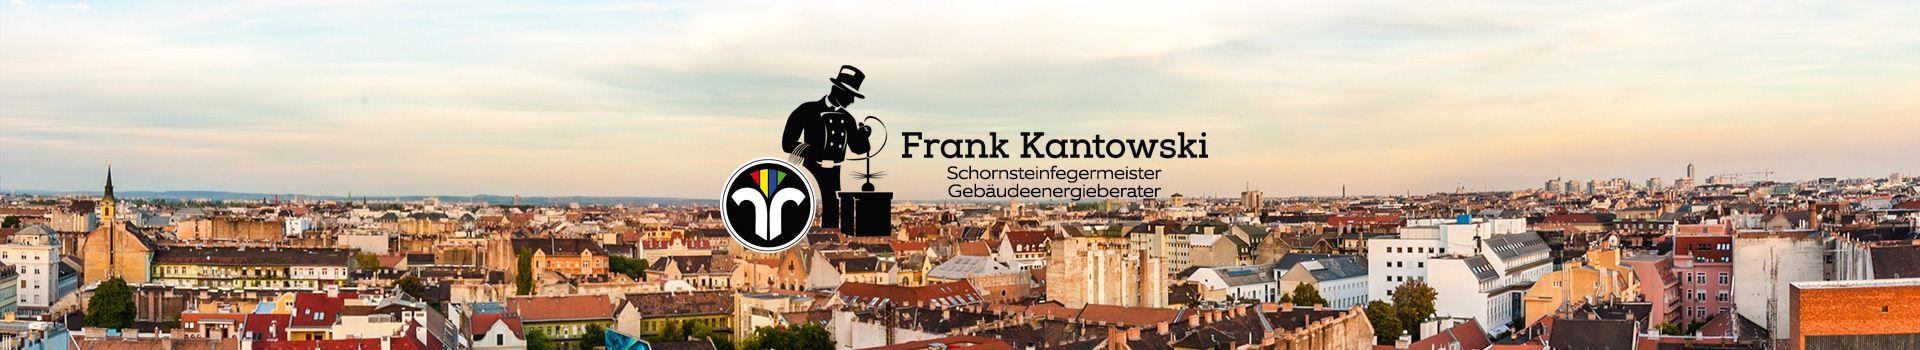 Schornsteinfeger Kantowski